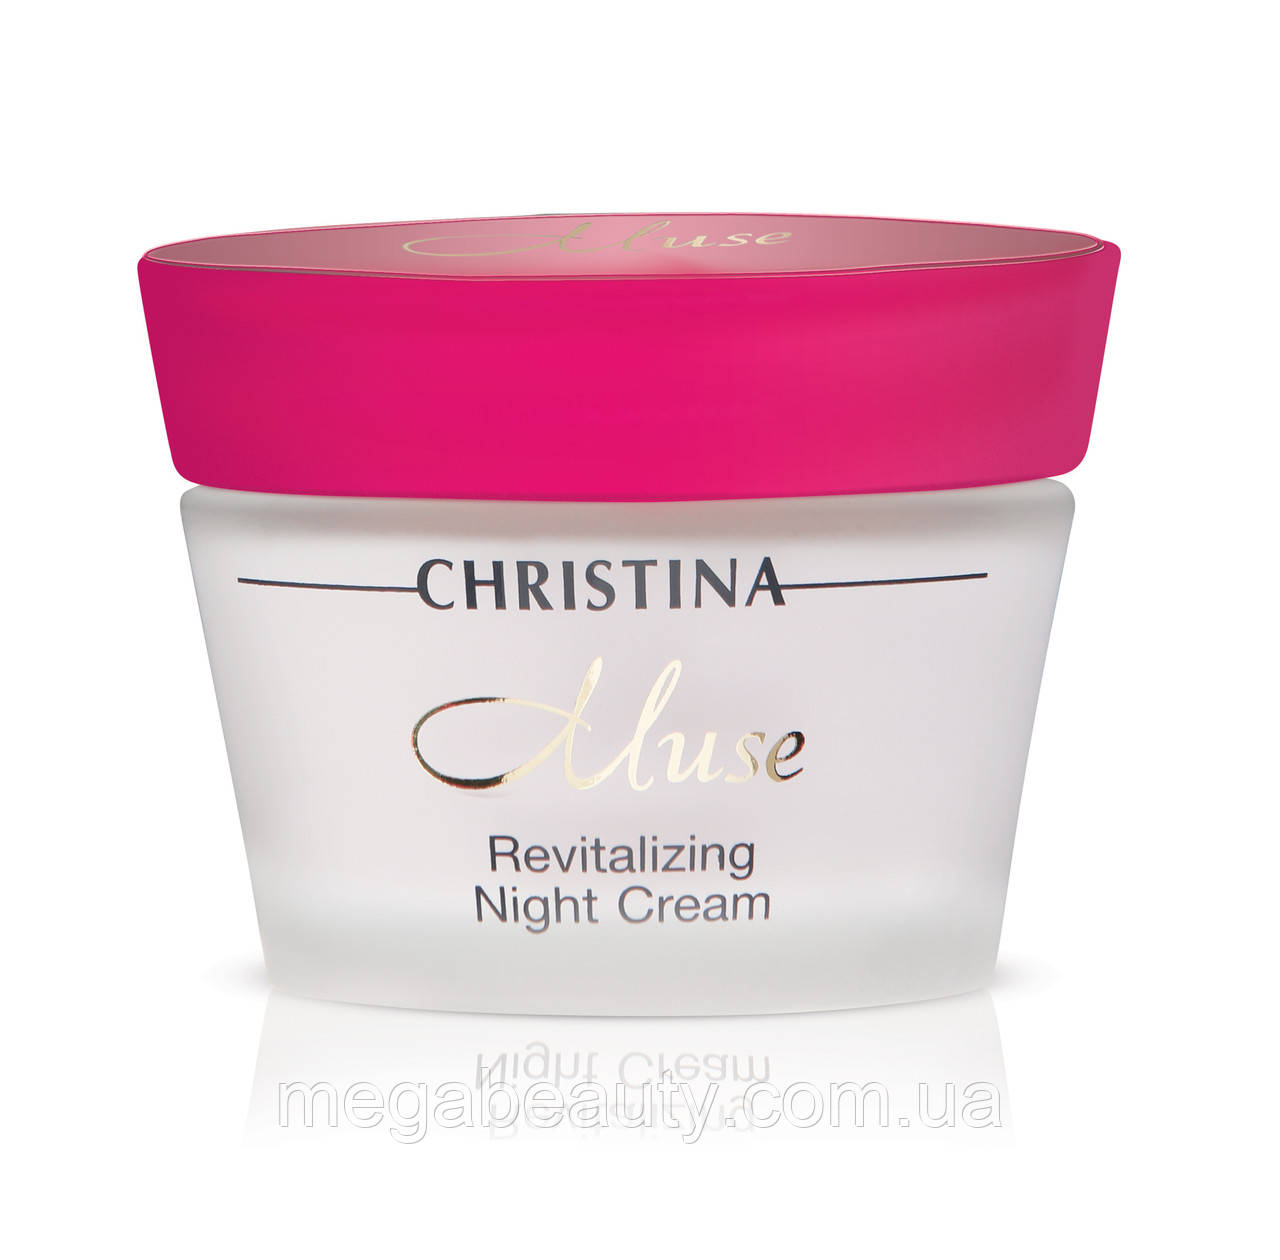 Muse Revitalizing Night Cream - Мьюз Восстанавливающий ночной крем, 50 мл